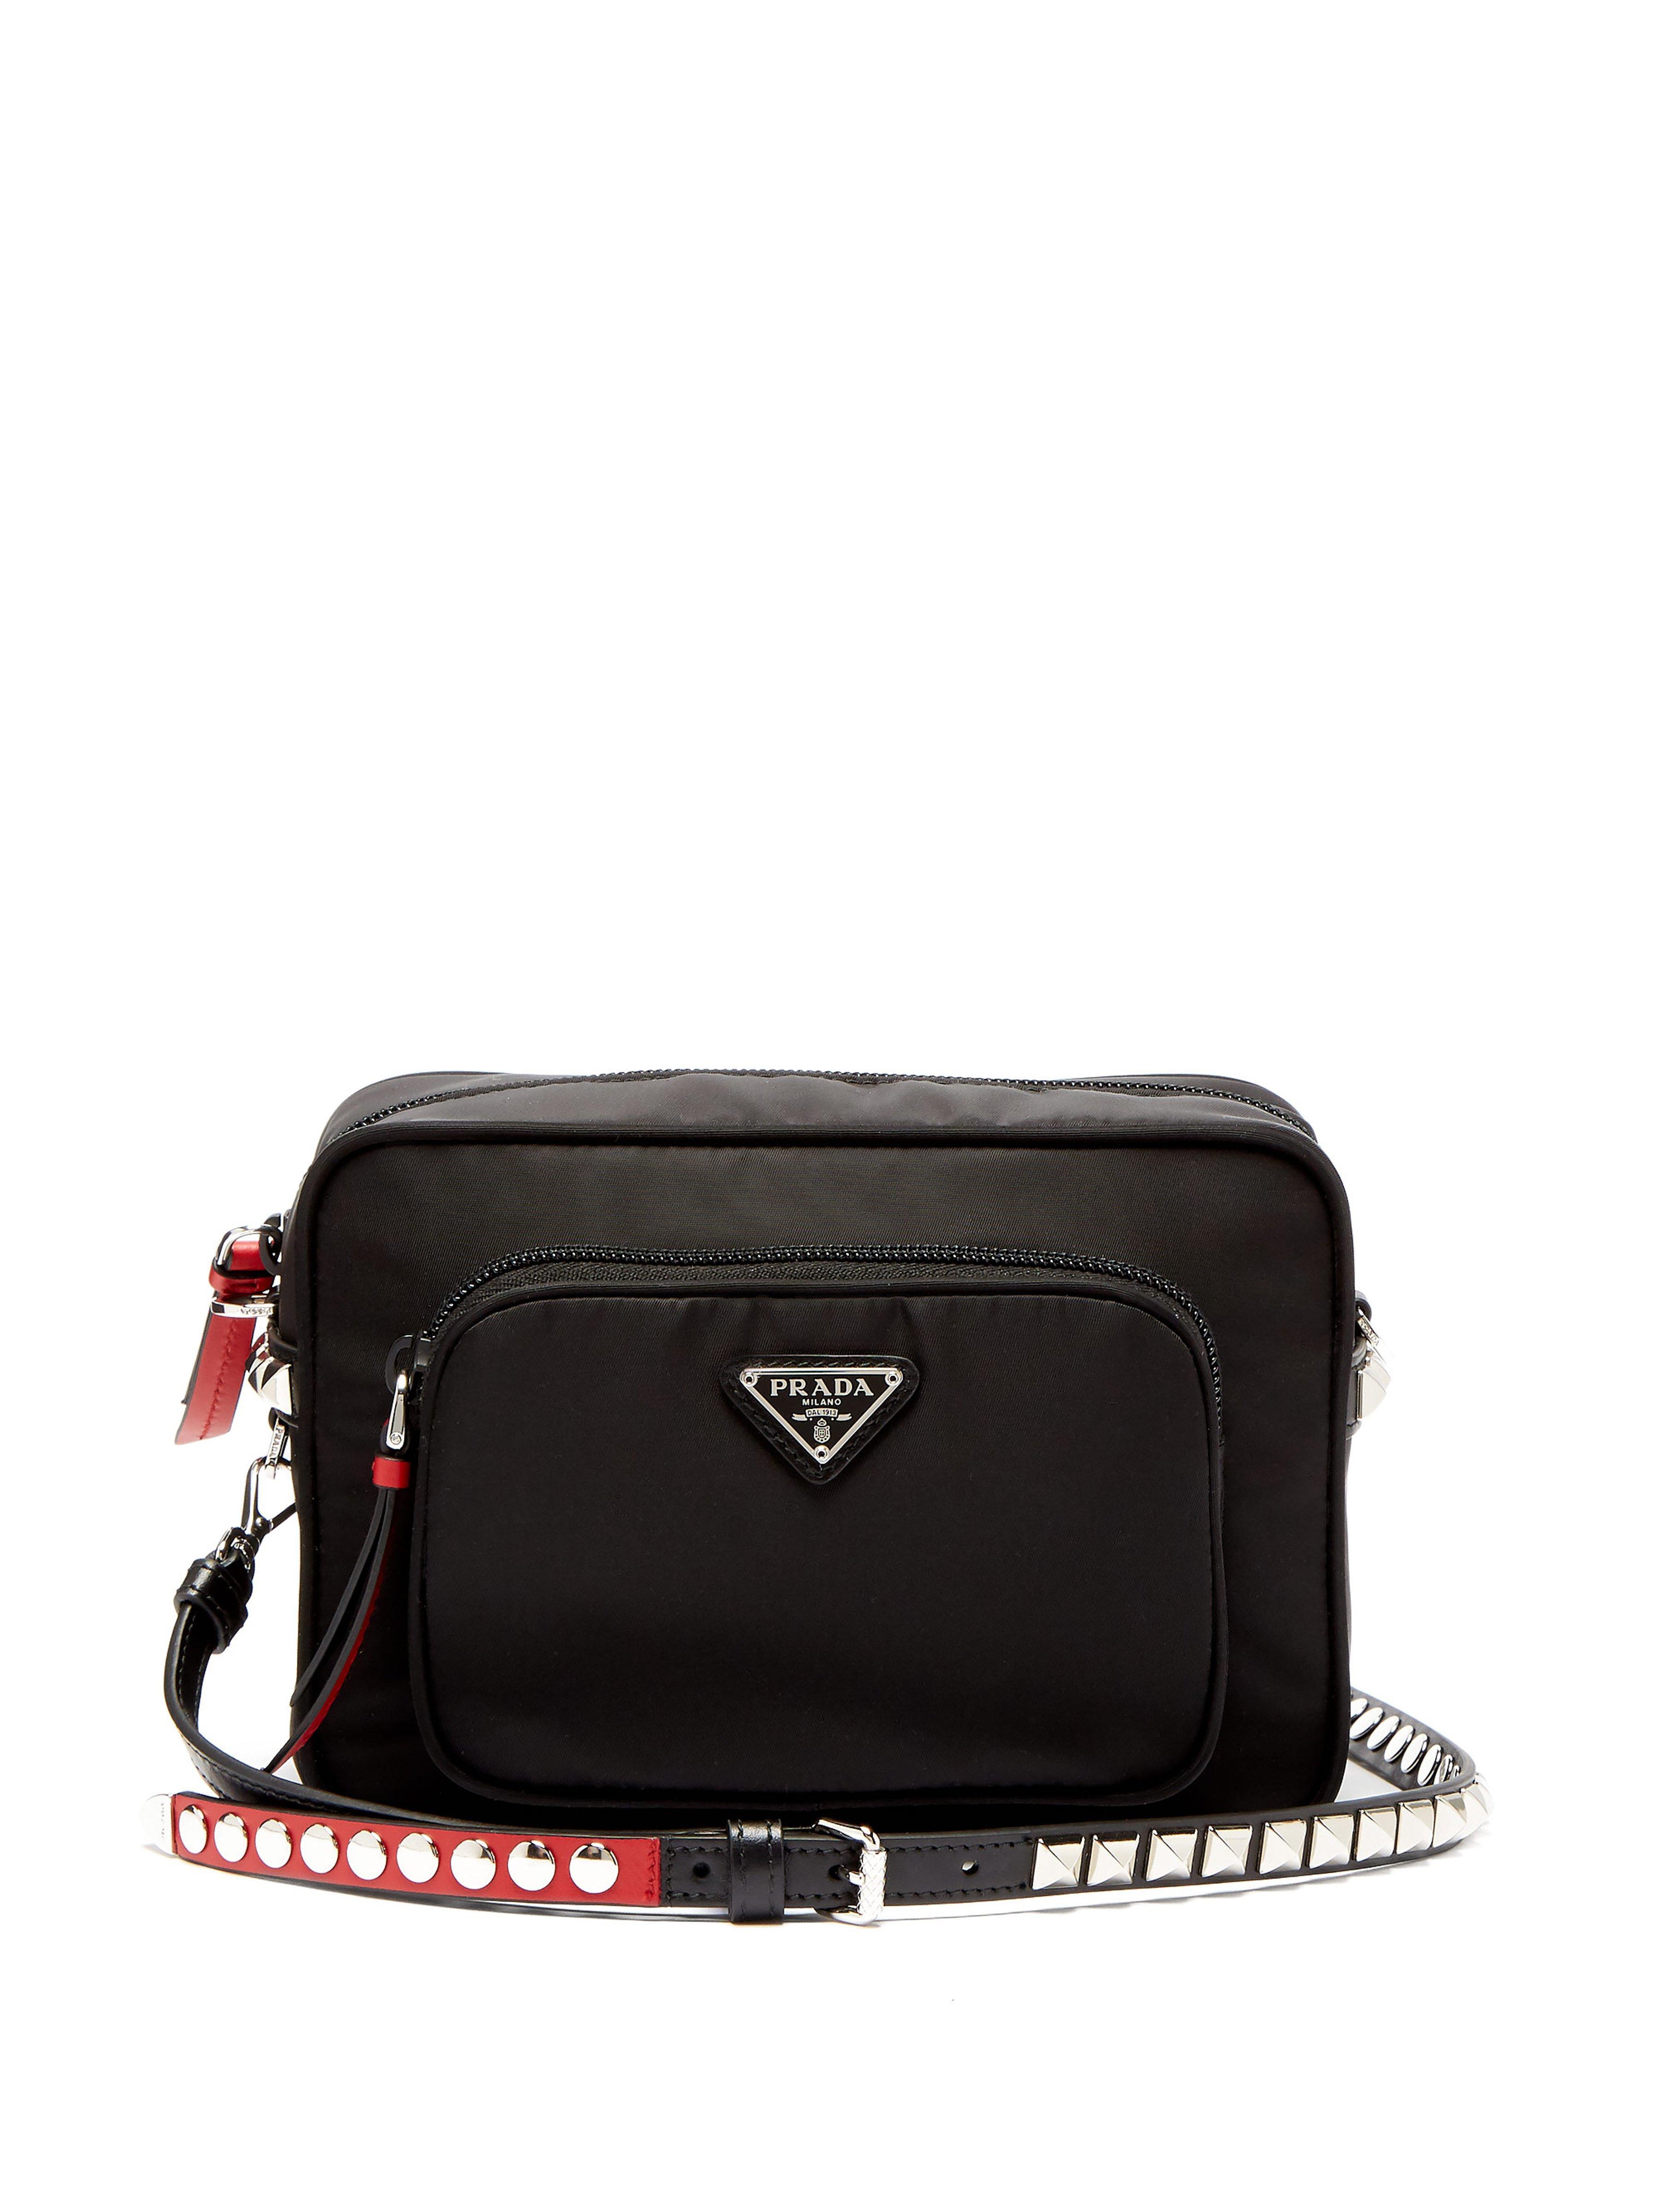 090d33d76d1a Prada - Black New Vela Mini Studded Nylon Cross Body Bag - Lyst. View  fullscreen